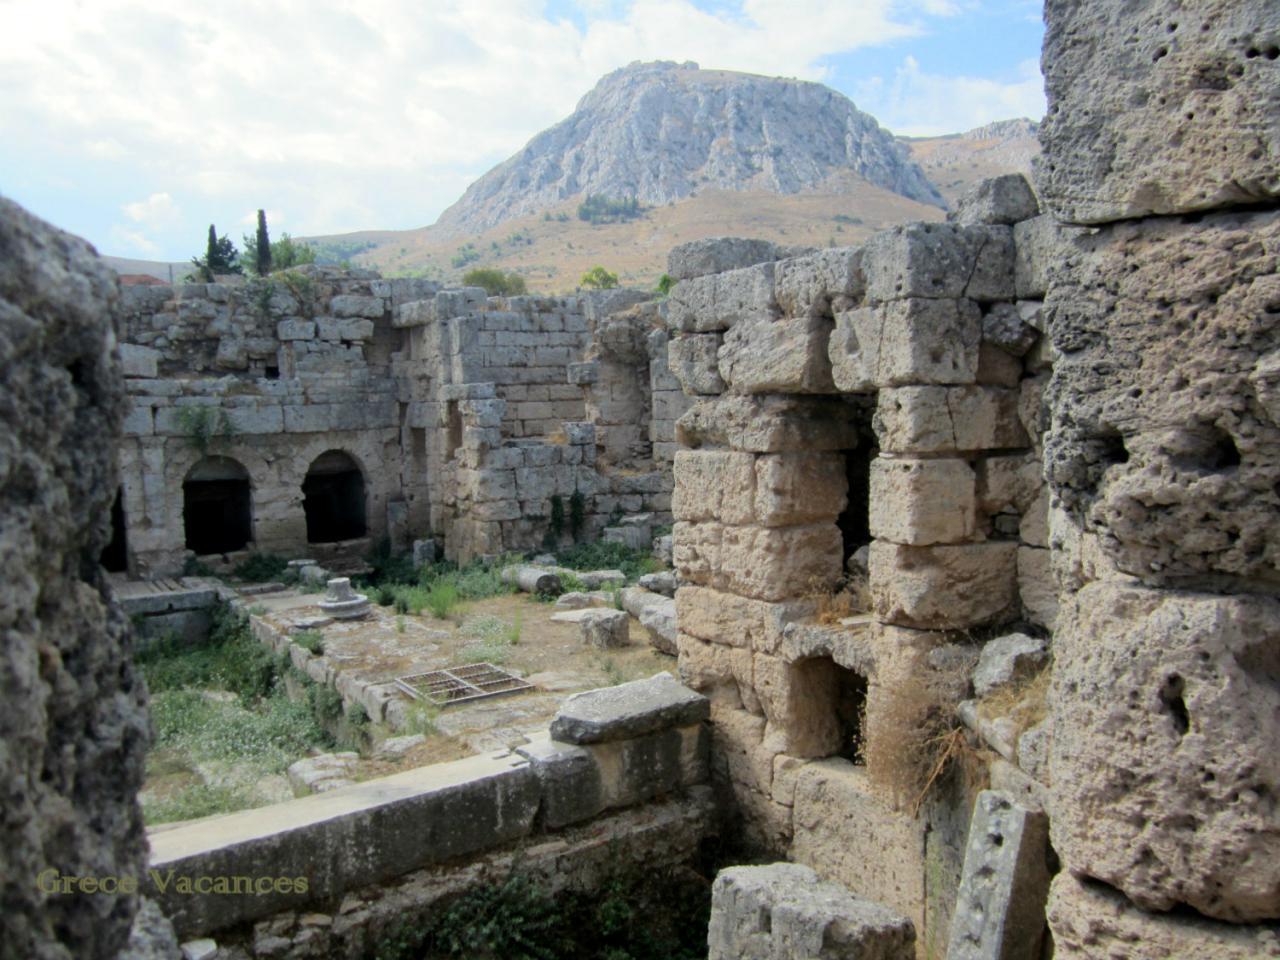 IMG_0073-Ancienne Corinthe - GV-ip